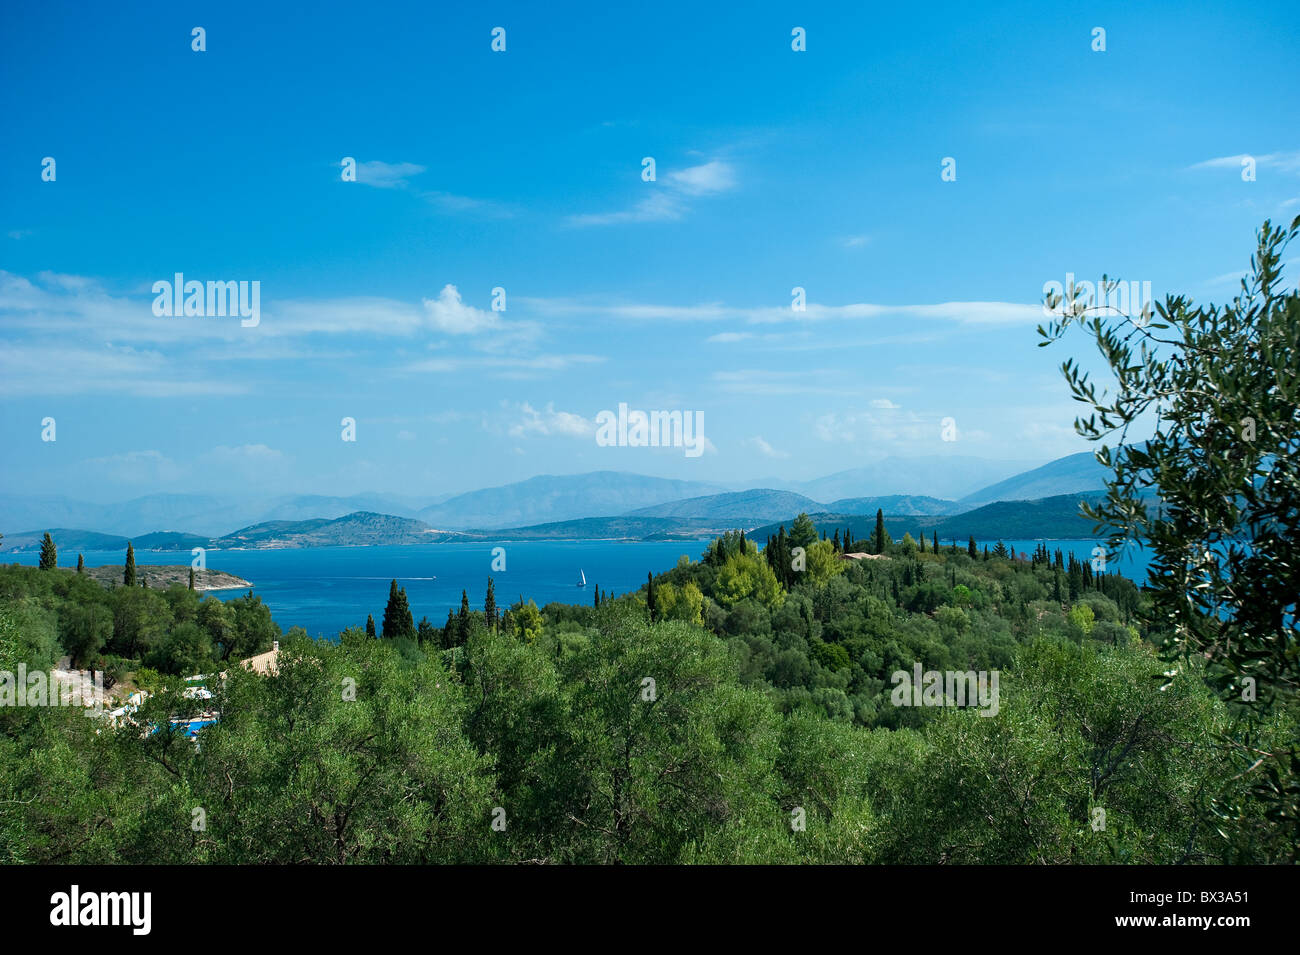 View at Kerasia, Corfu, Greece - Stock Image